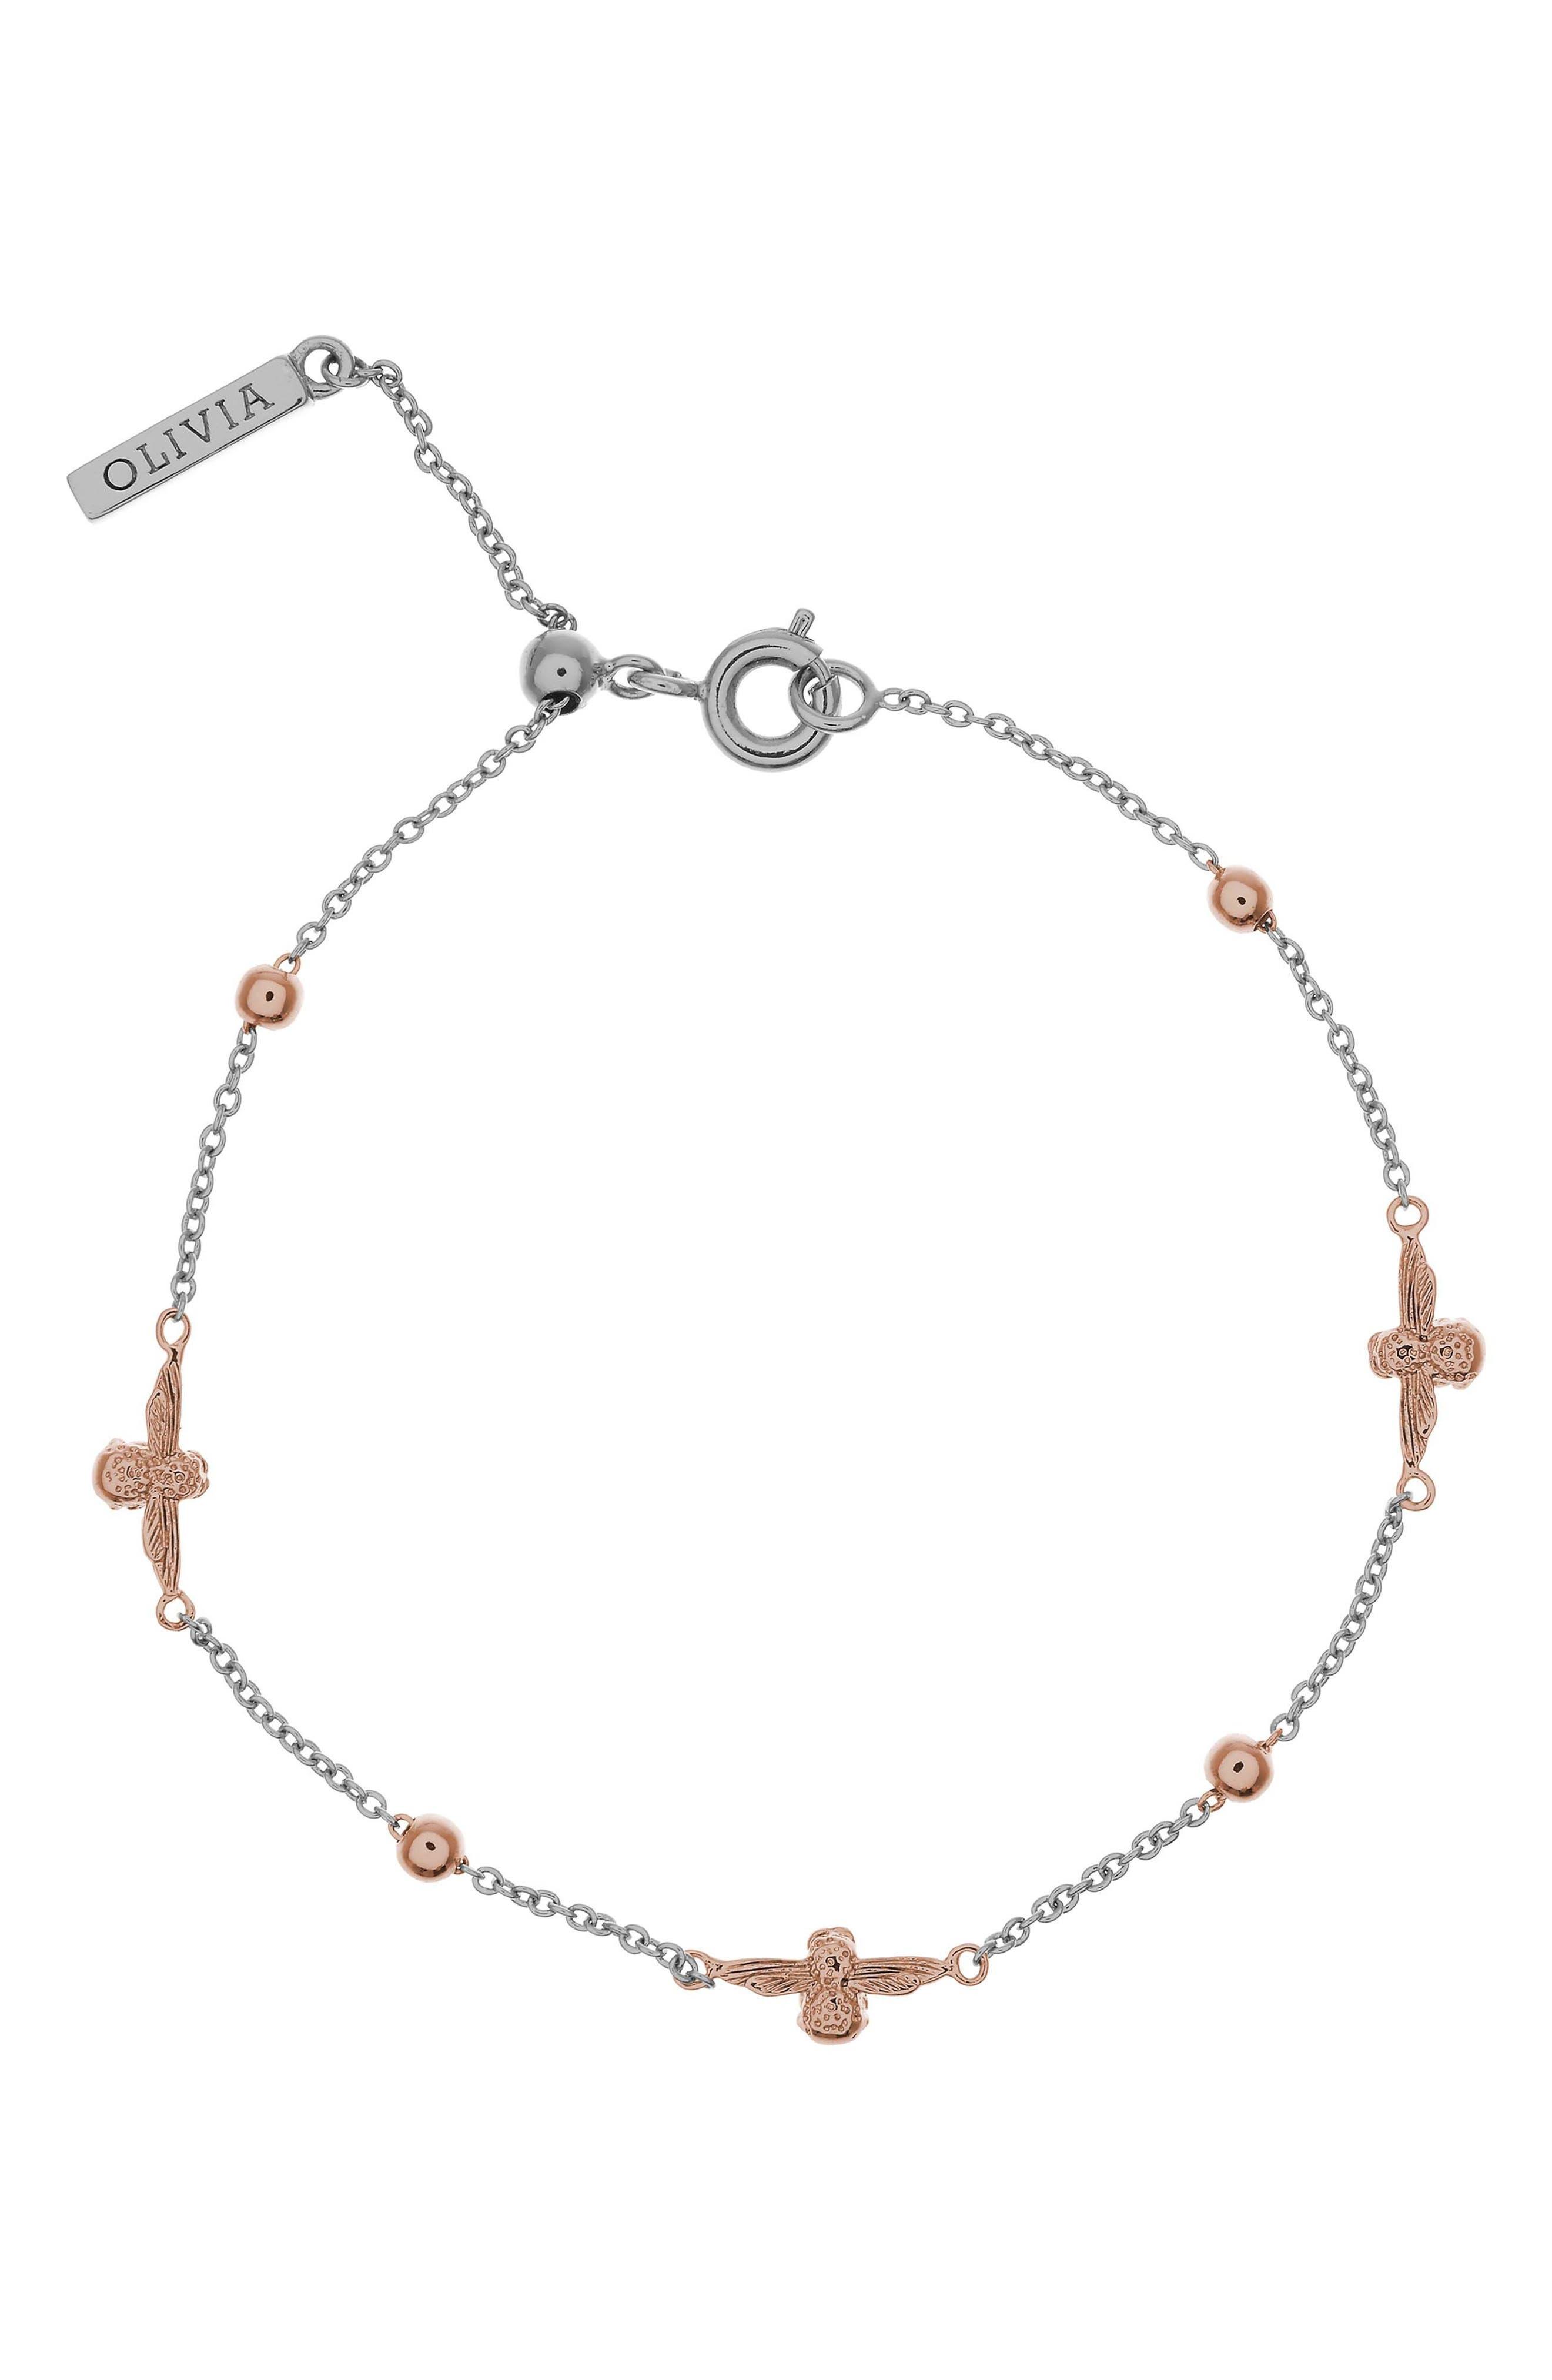 Main Image - Olivia Burton Queen Bee Ball Chain Bracelet